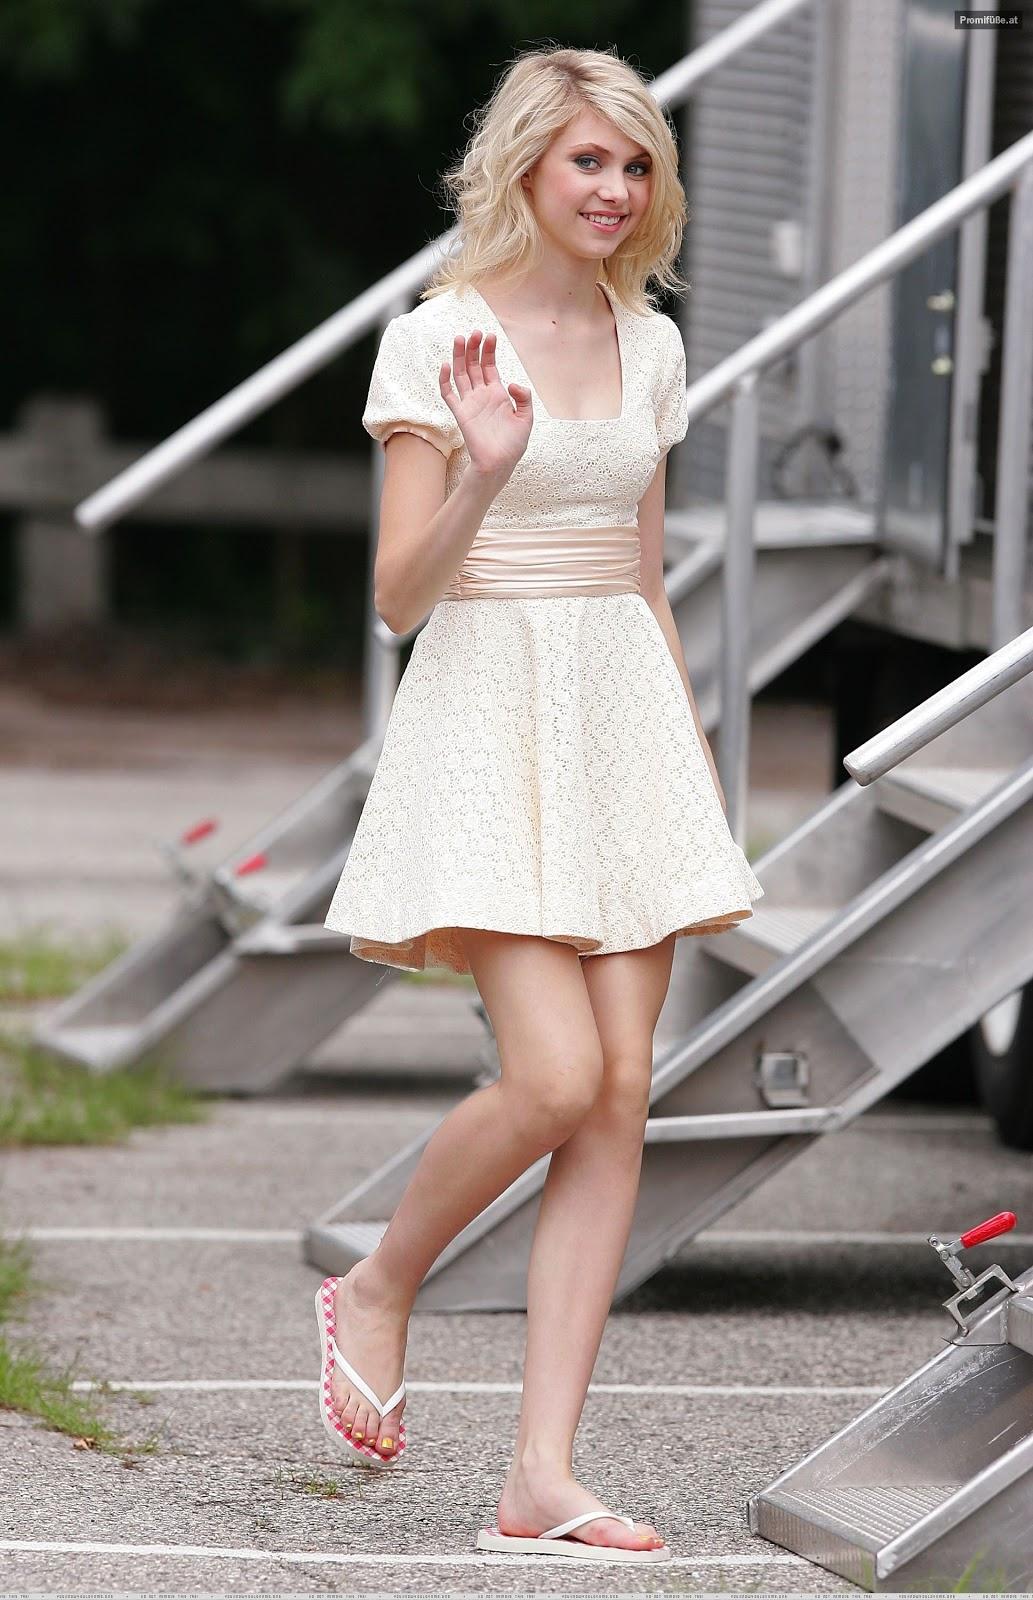 http://2.bp.blogspot.com/-t7ApYFLUSwY/T56lrCDtoVI/AAAAAAAADc0/aXHCzo5mqbk/s1600/Taylor-Momsen-Feet-2.jpg